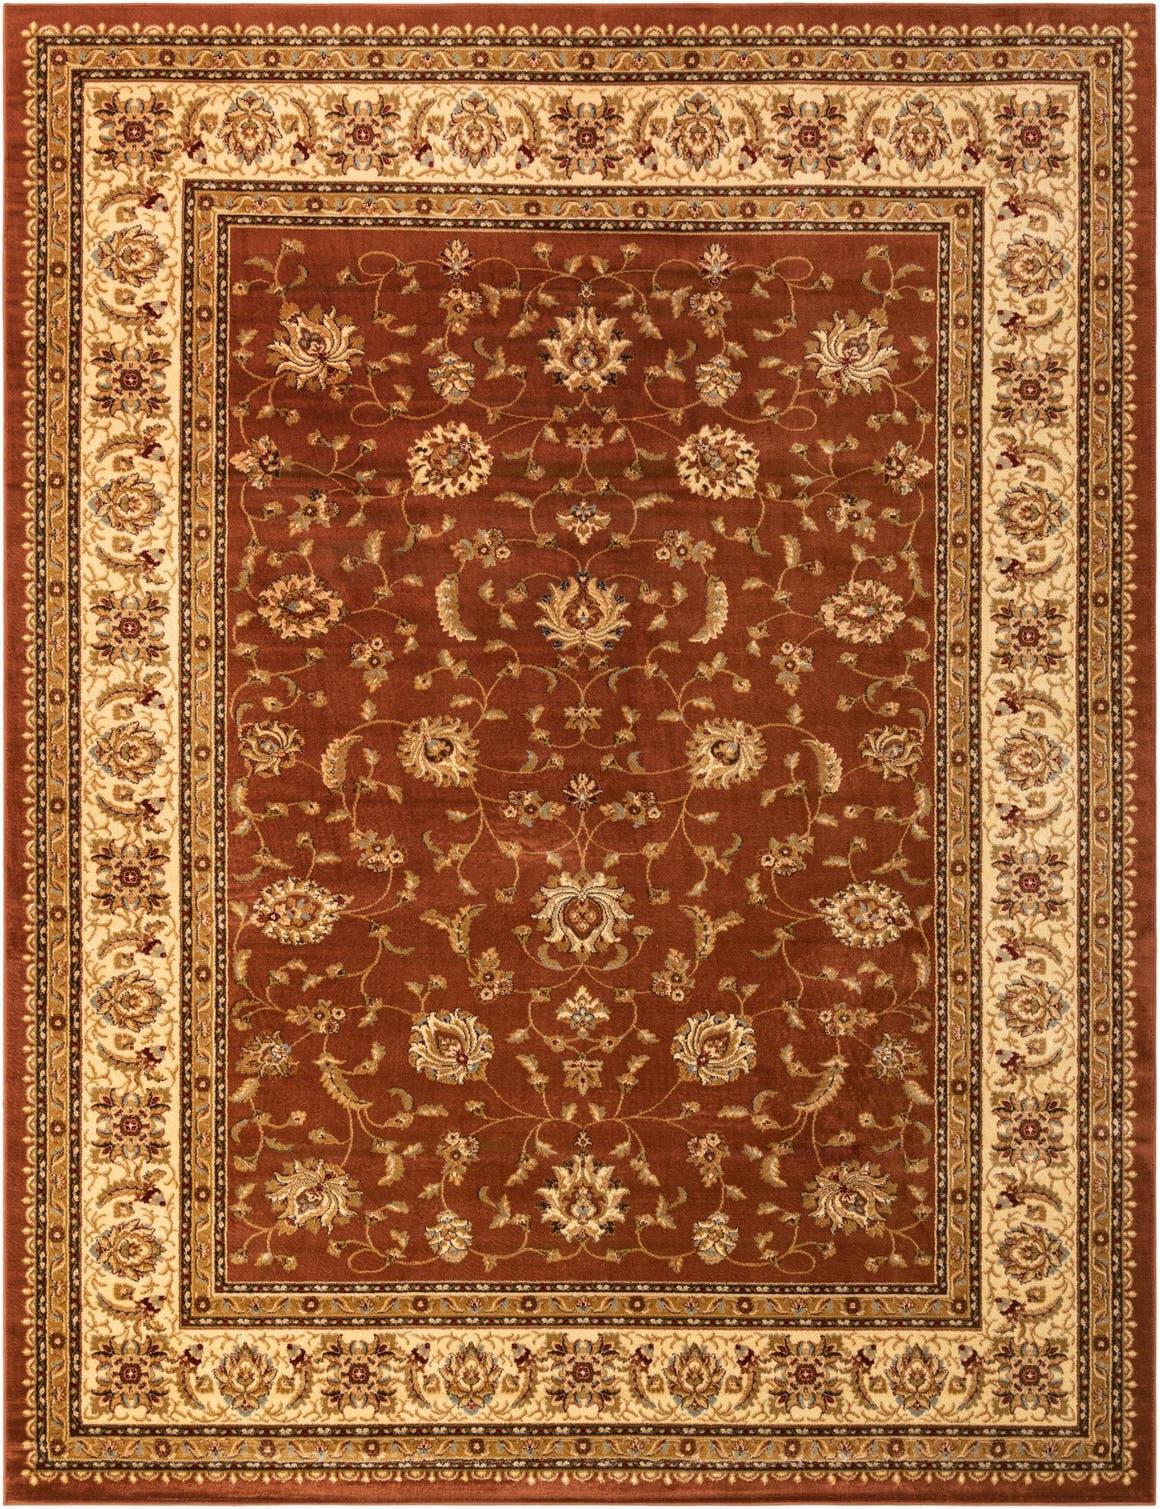 10' x 13' Classic Agra Rug main image